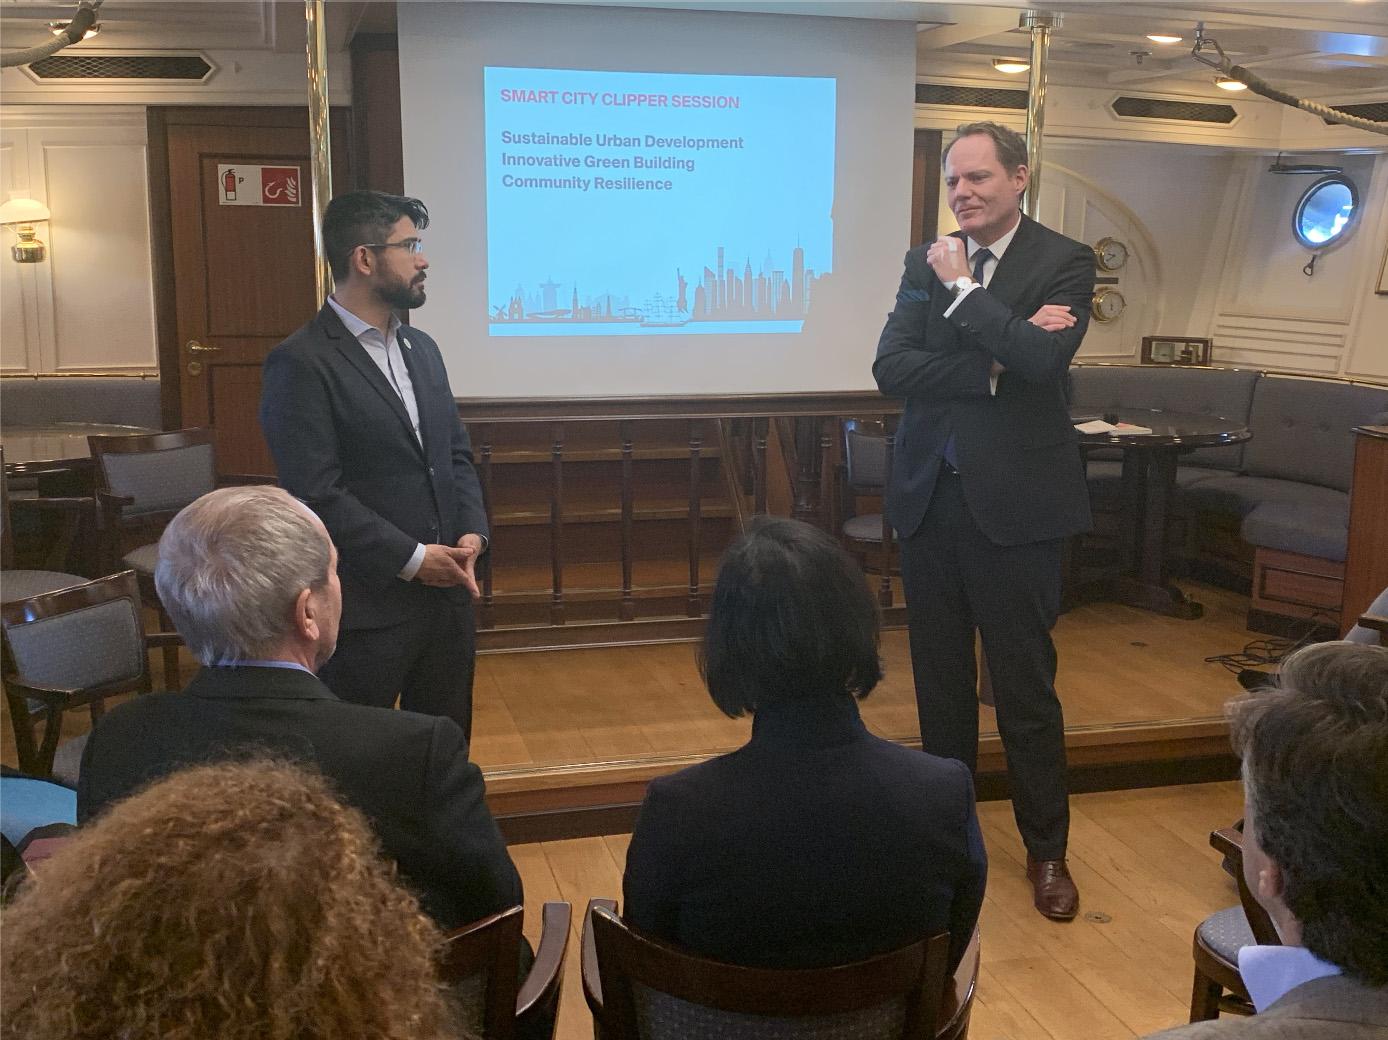 Brooklyn City Council Member Carlos Menchaca and Vice-mayor of Amsterdam Udo Kock.